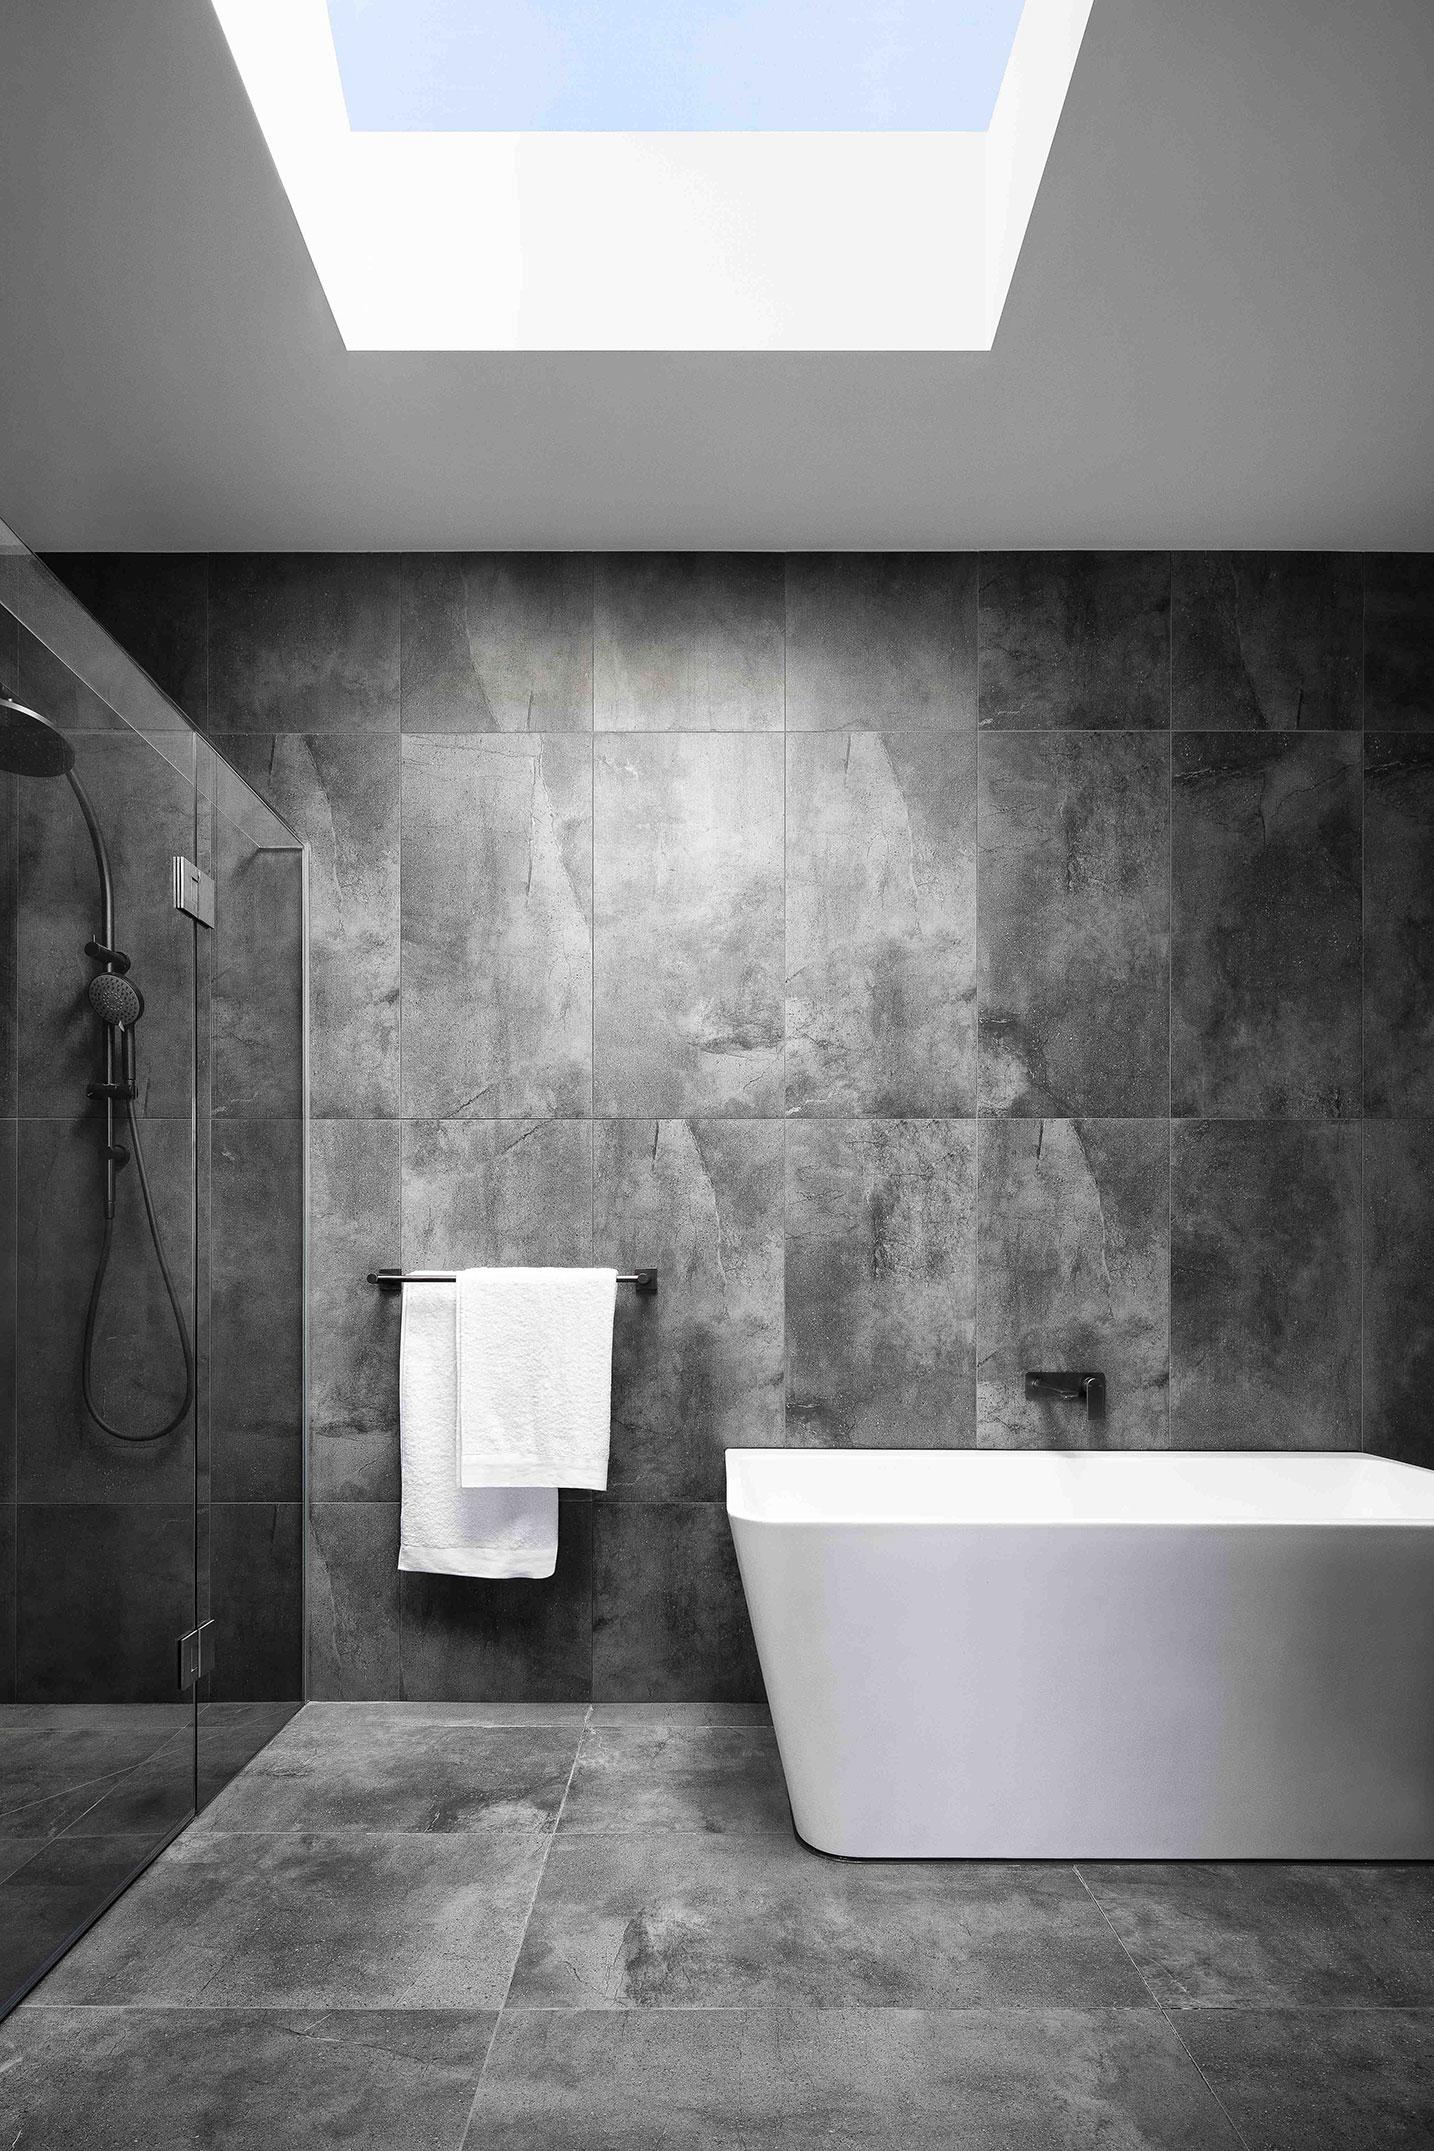 c.kairouz.architects-thornbury-townhouses-interior-bathroom-skylight